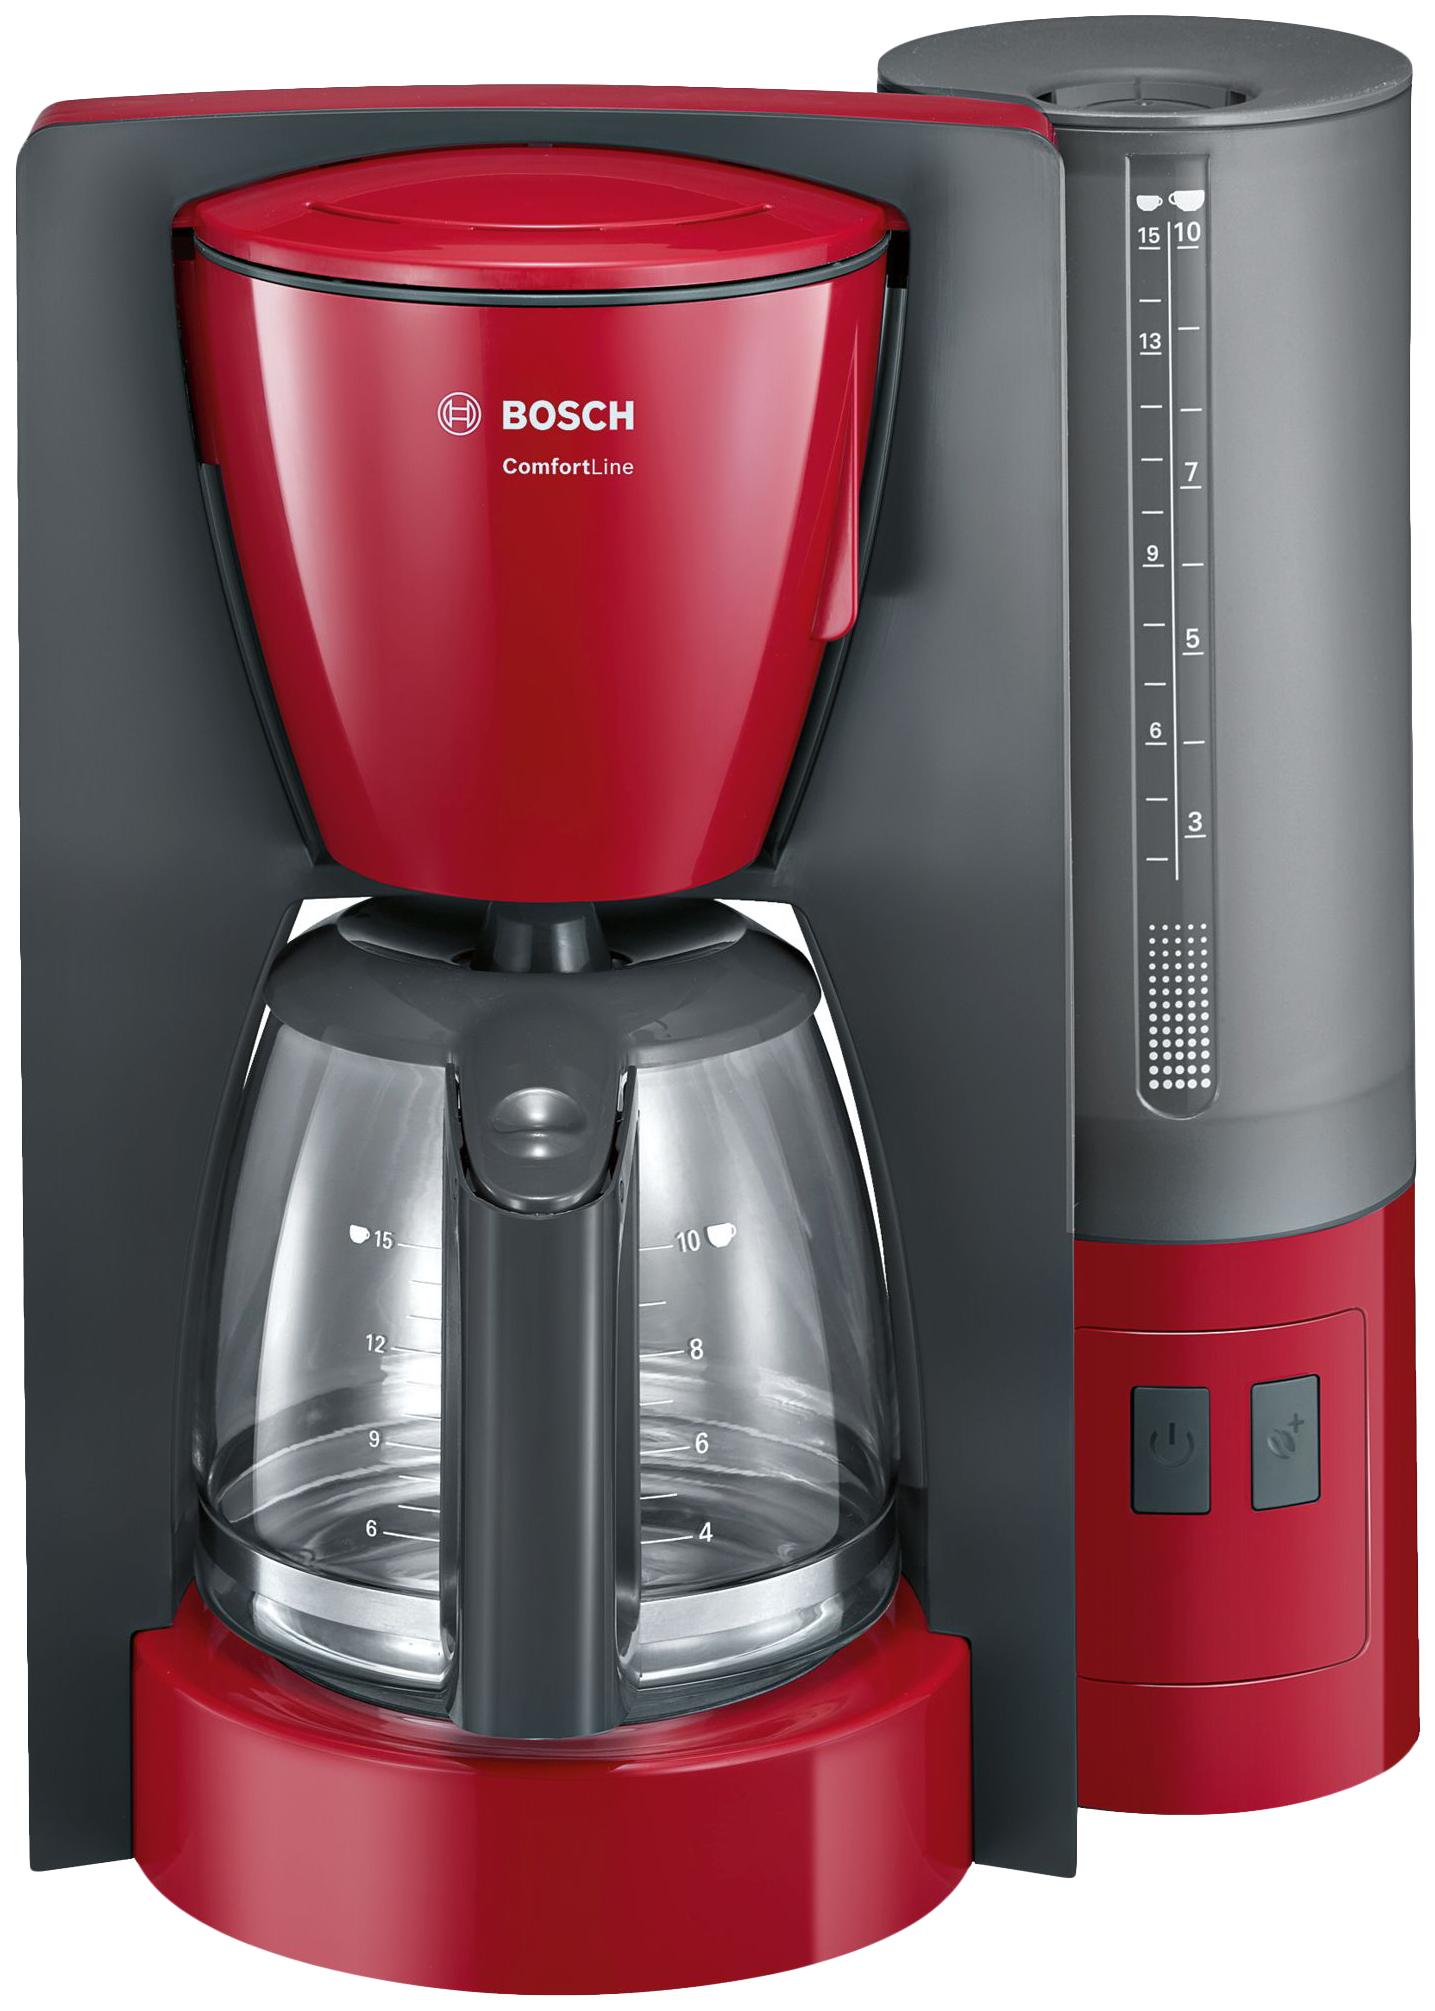 Кофеварка капельного типа Bosch ComfortLine TKA6A044 Red фото